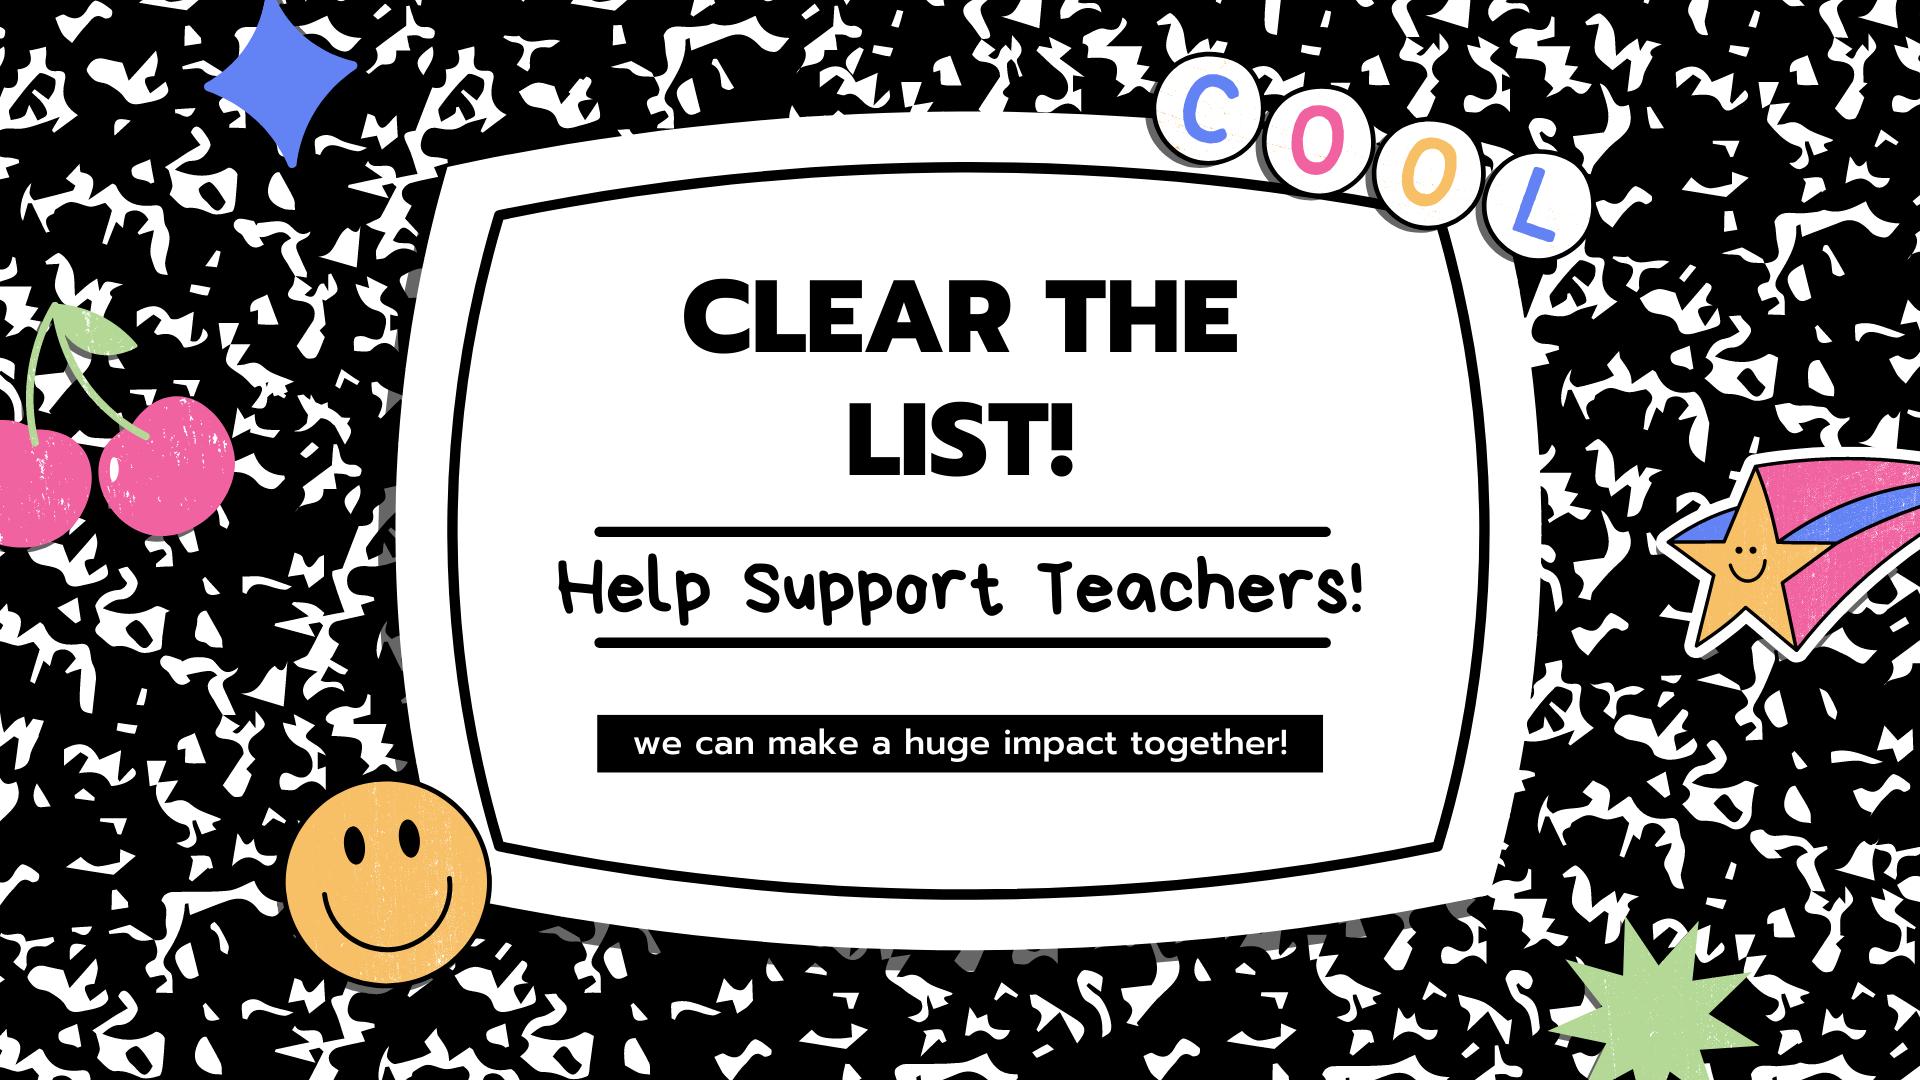 clear the list help support teachers